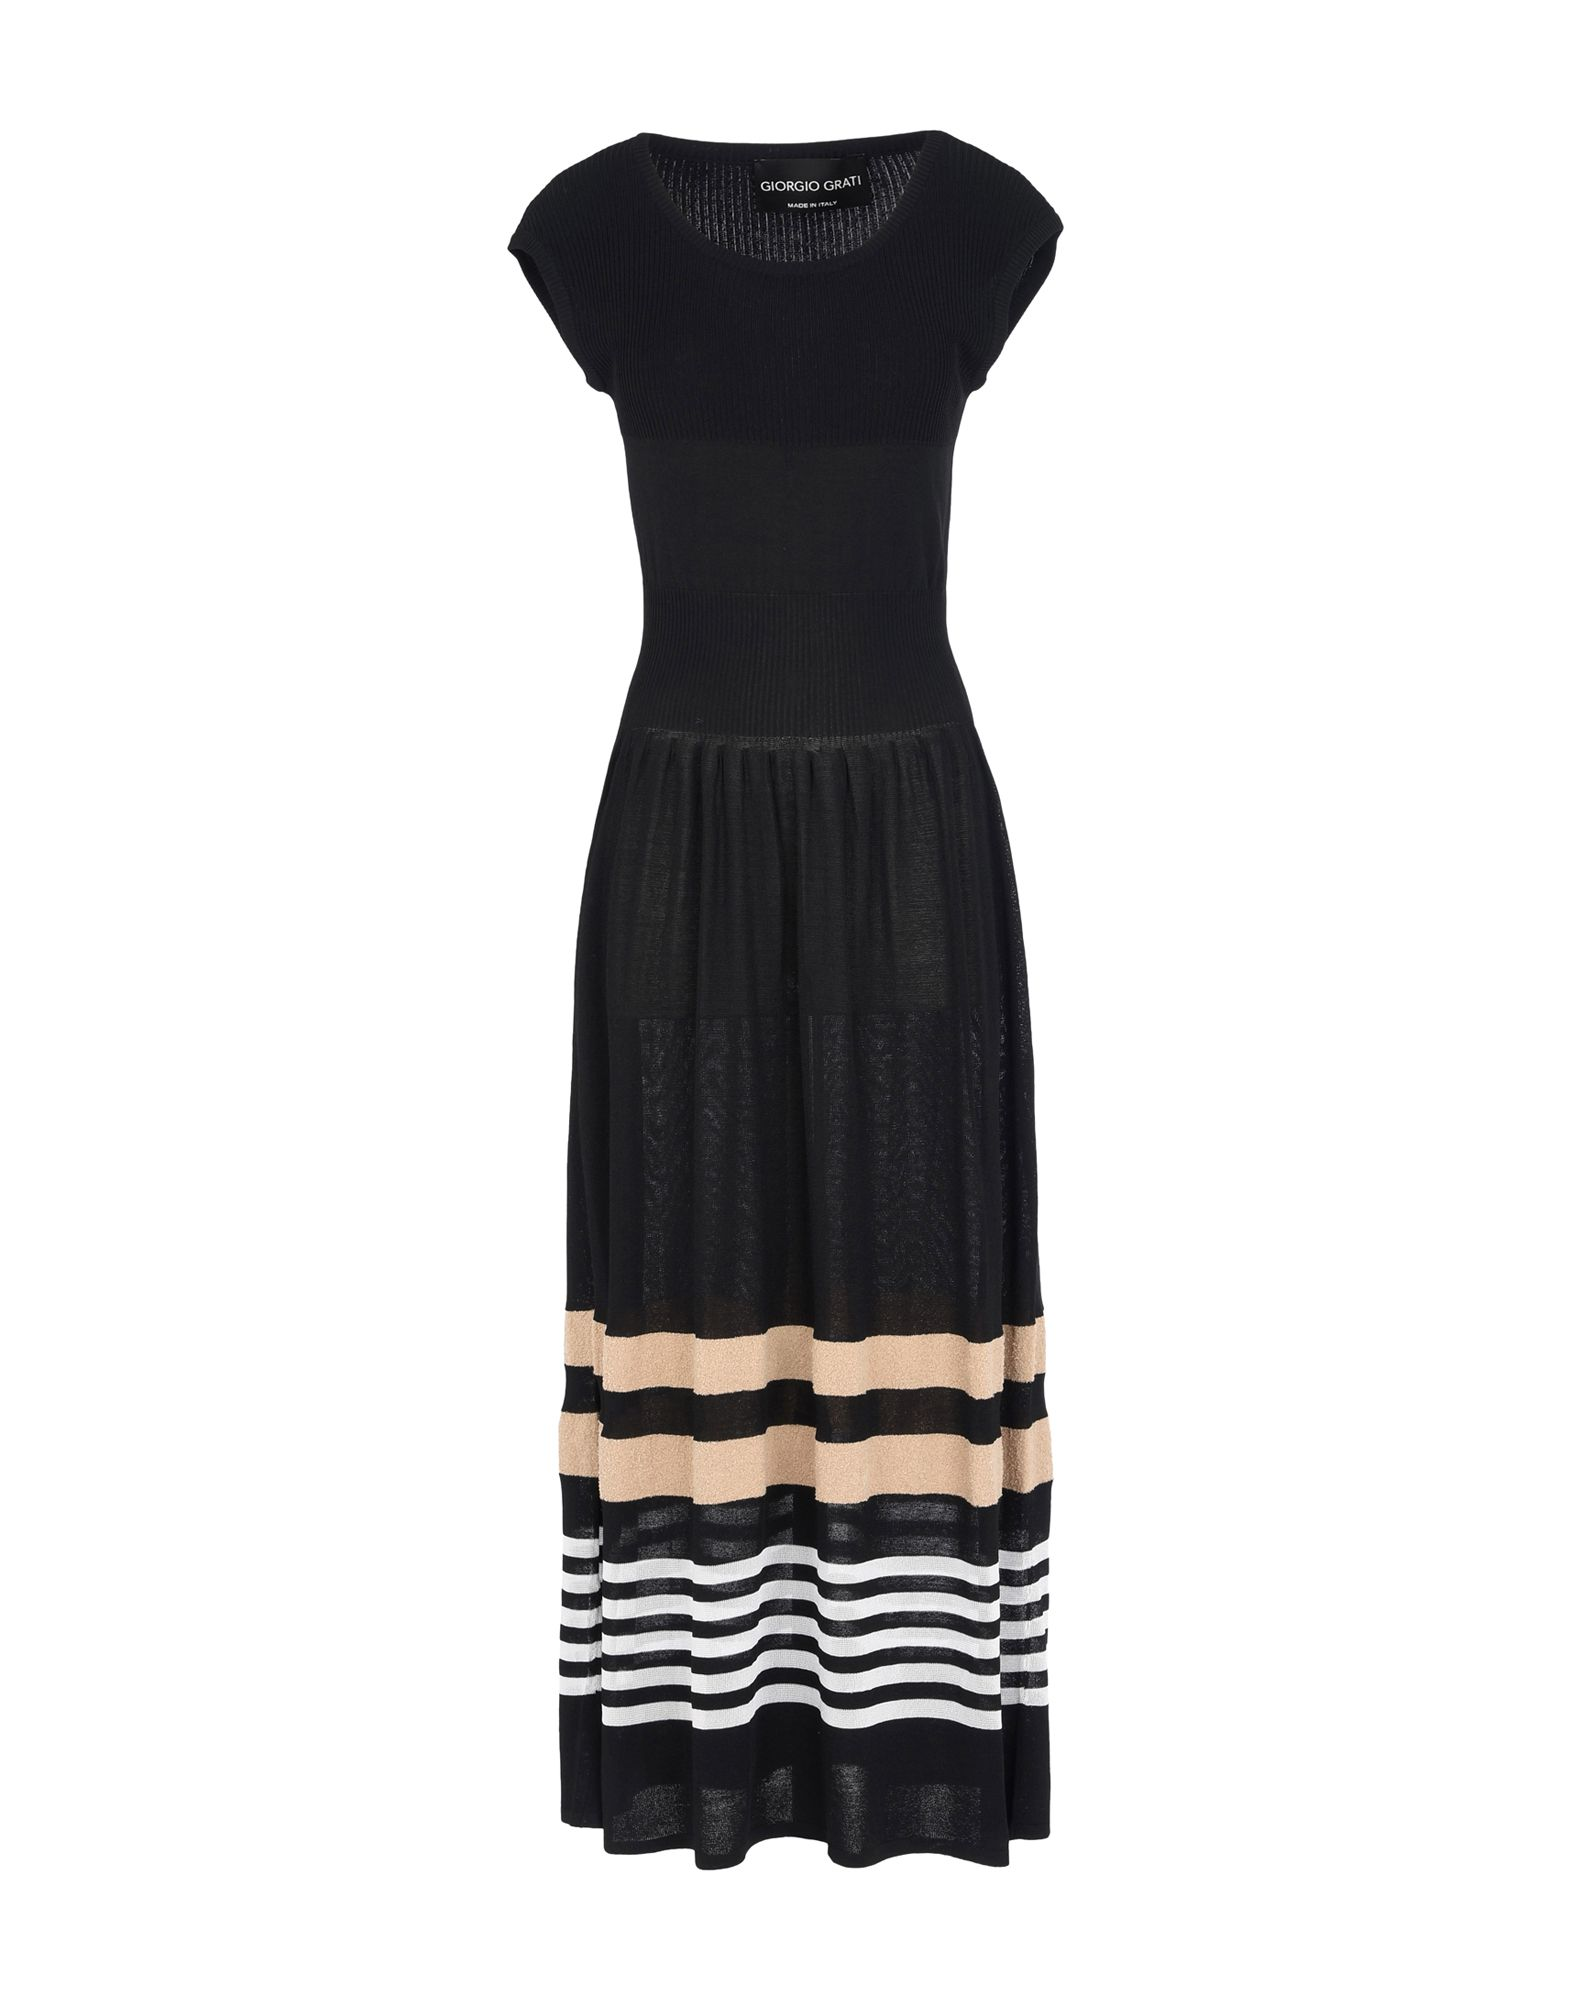 GIORGIO GRATI Платье длиной 3/4 lisa corti платье длиной 3 4